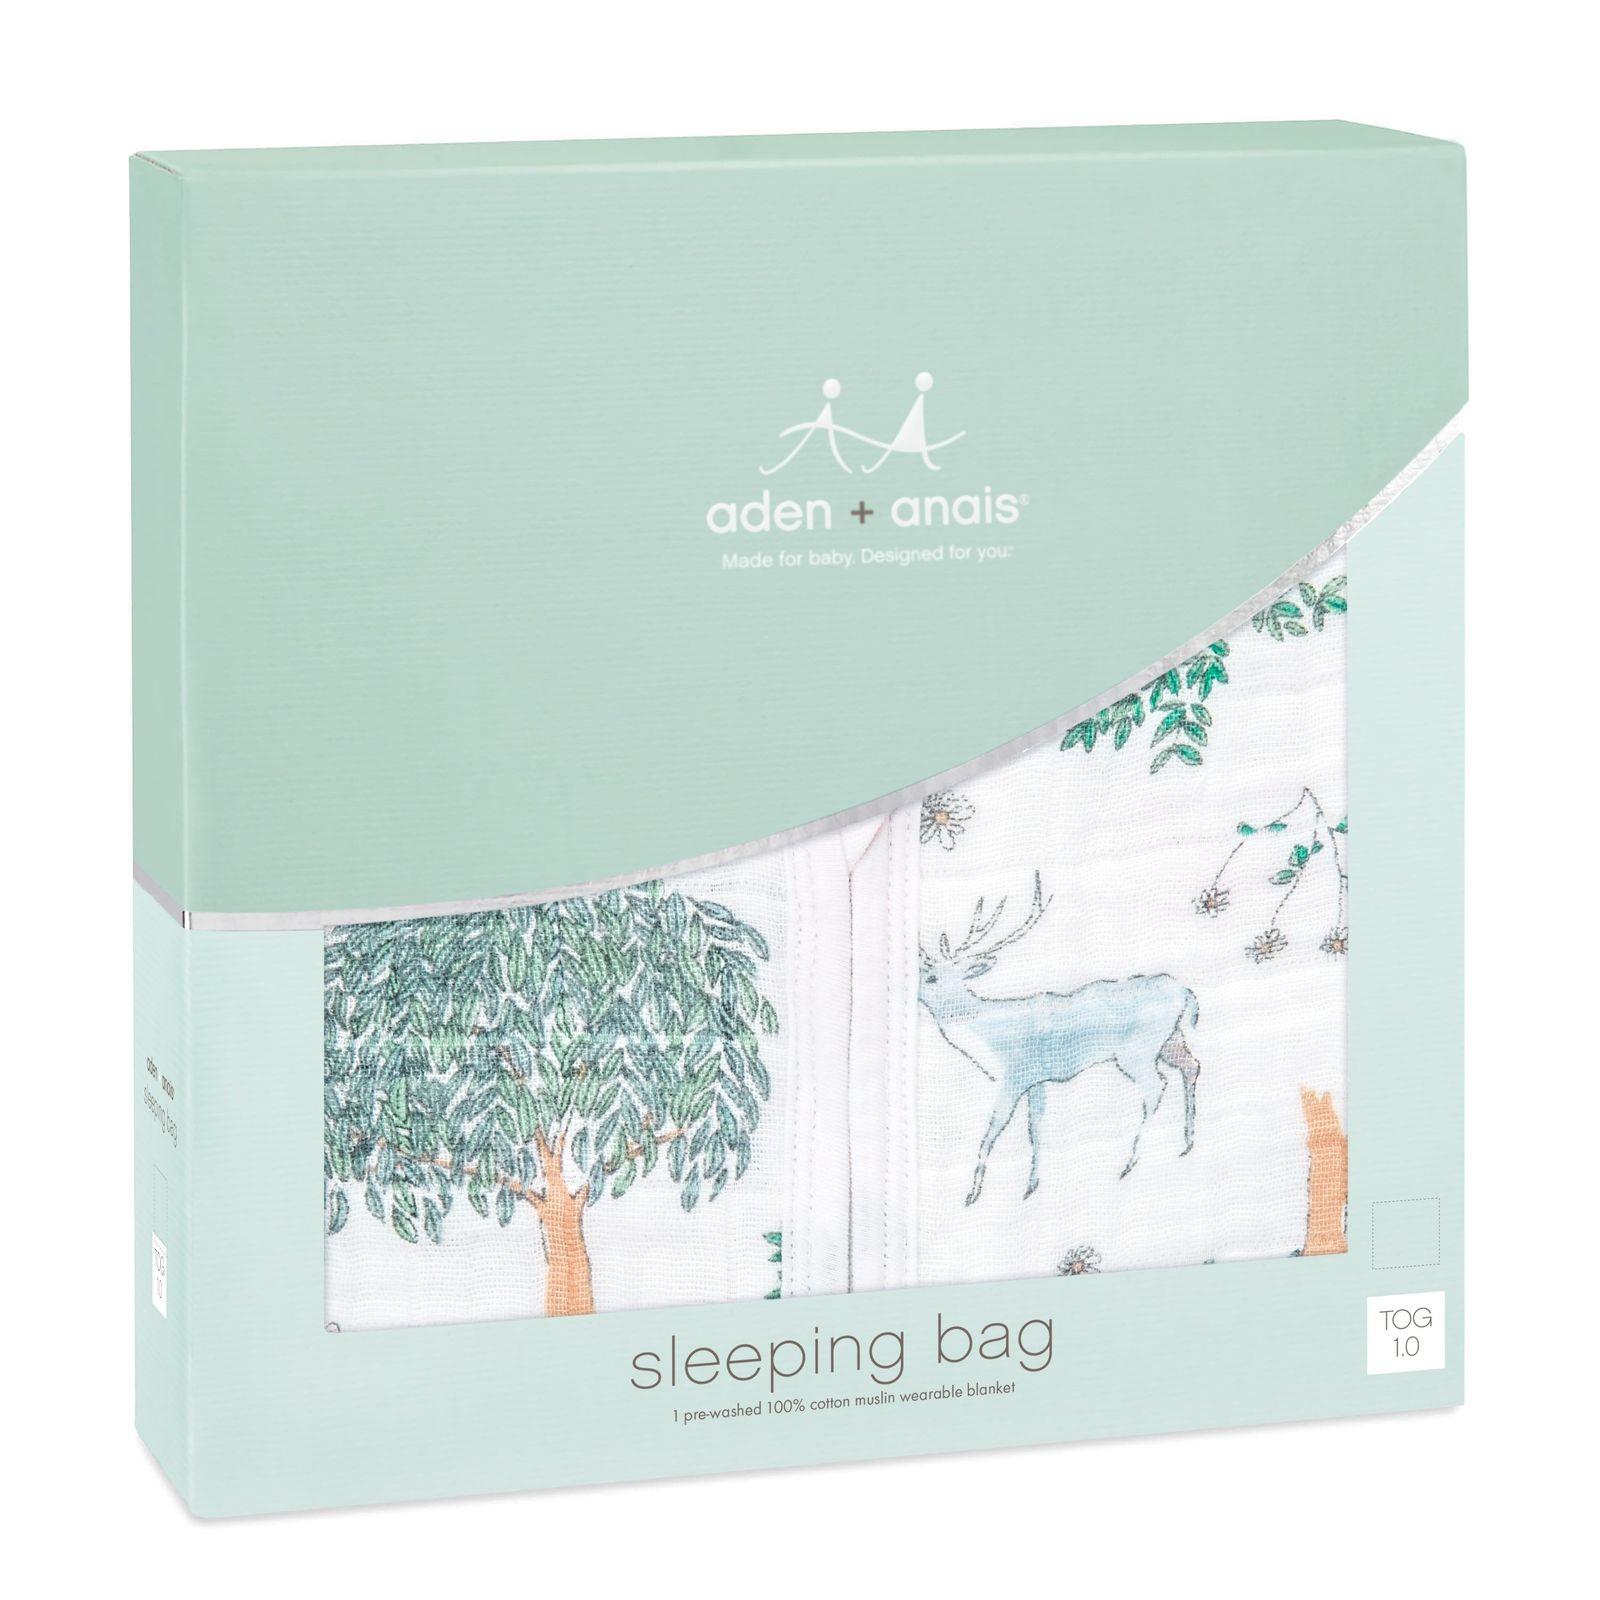 Aden + Anais: Classic Muslin Sleeping Bag - Forest Fantasy - Deer (Small) image